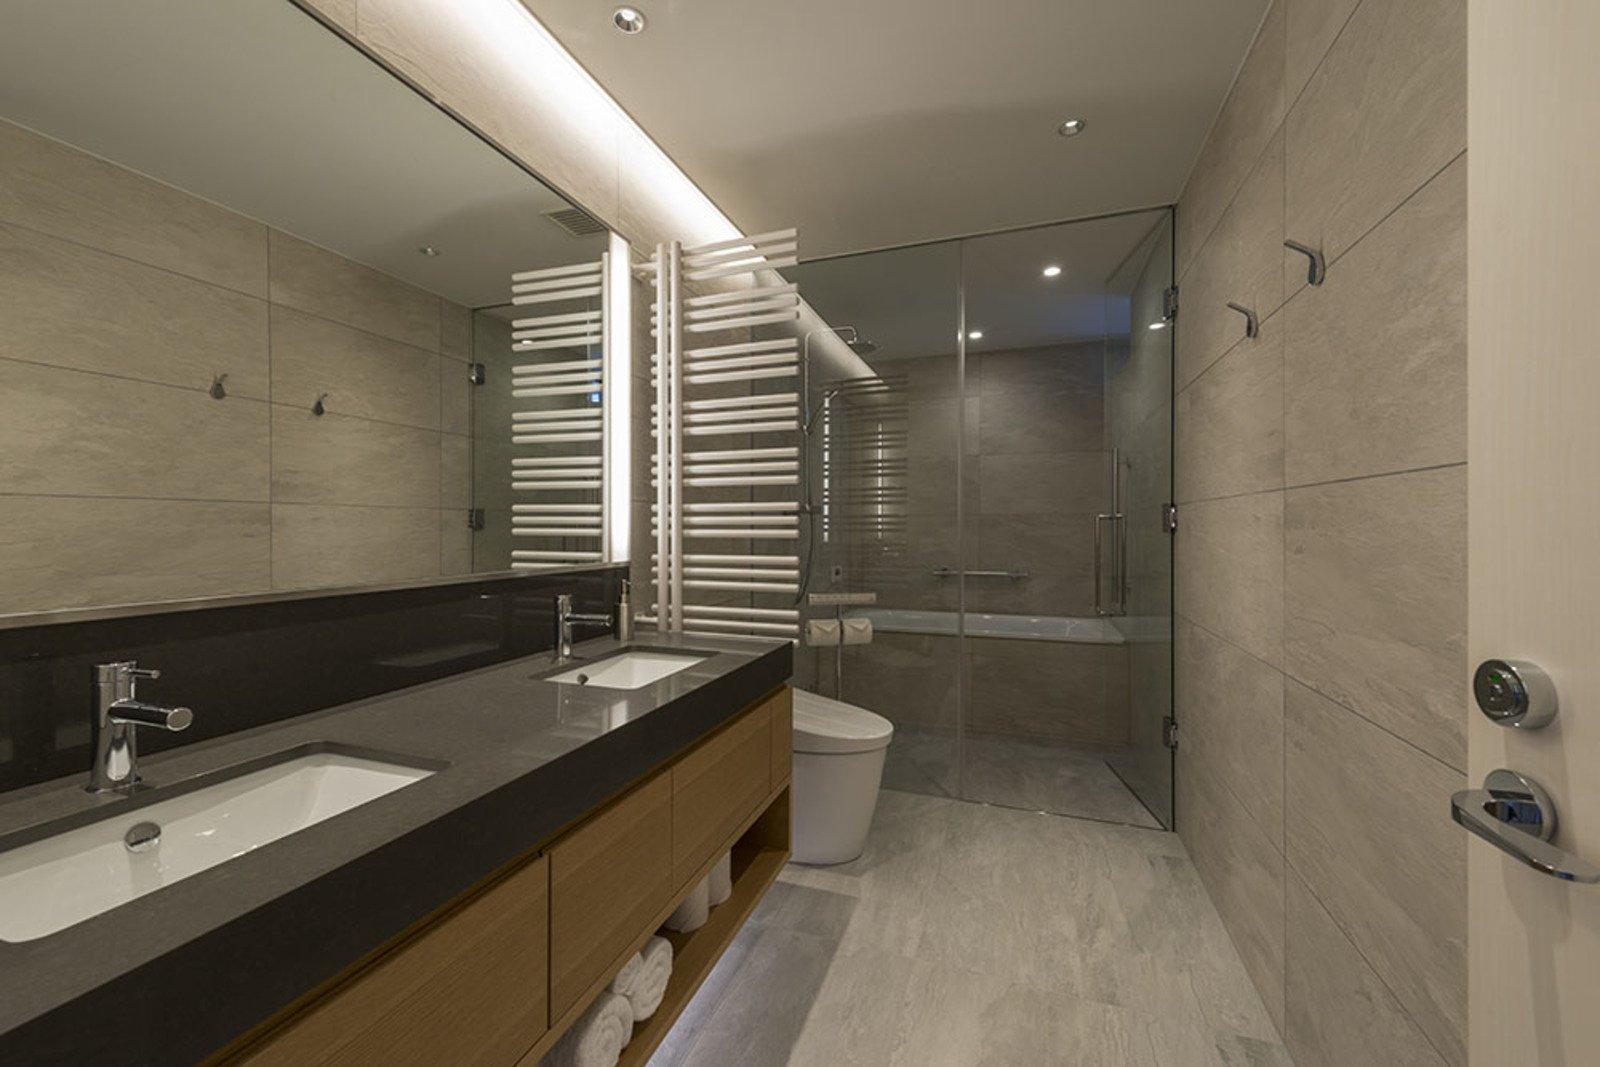 Penthouse bathroom 3 large